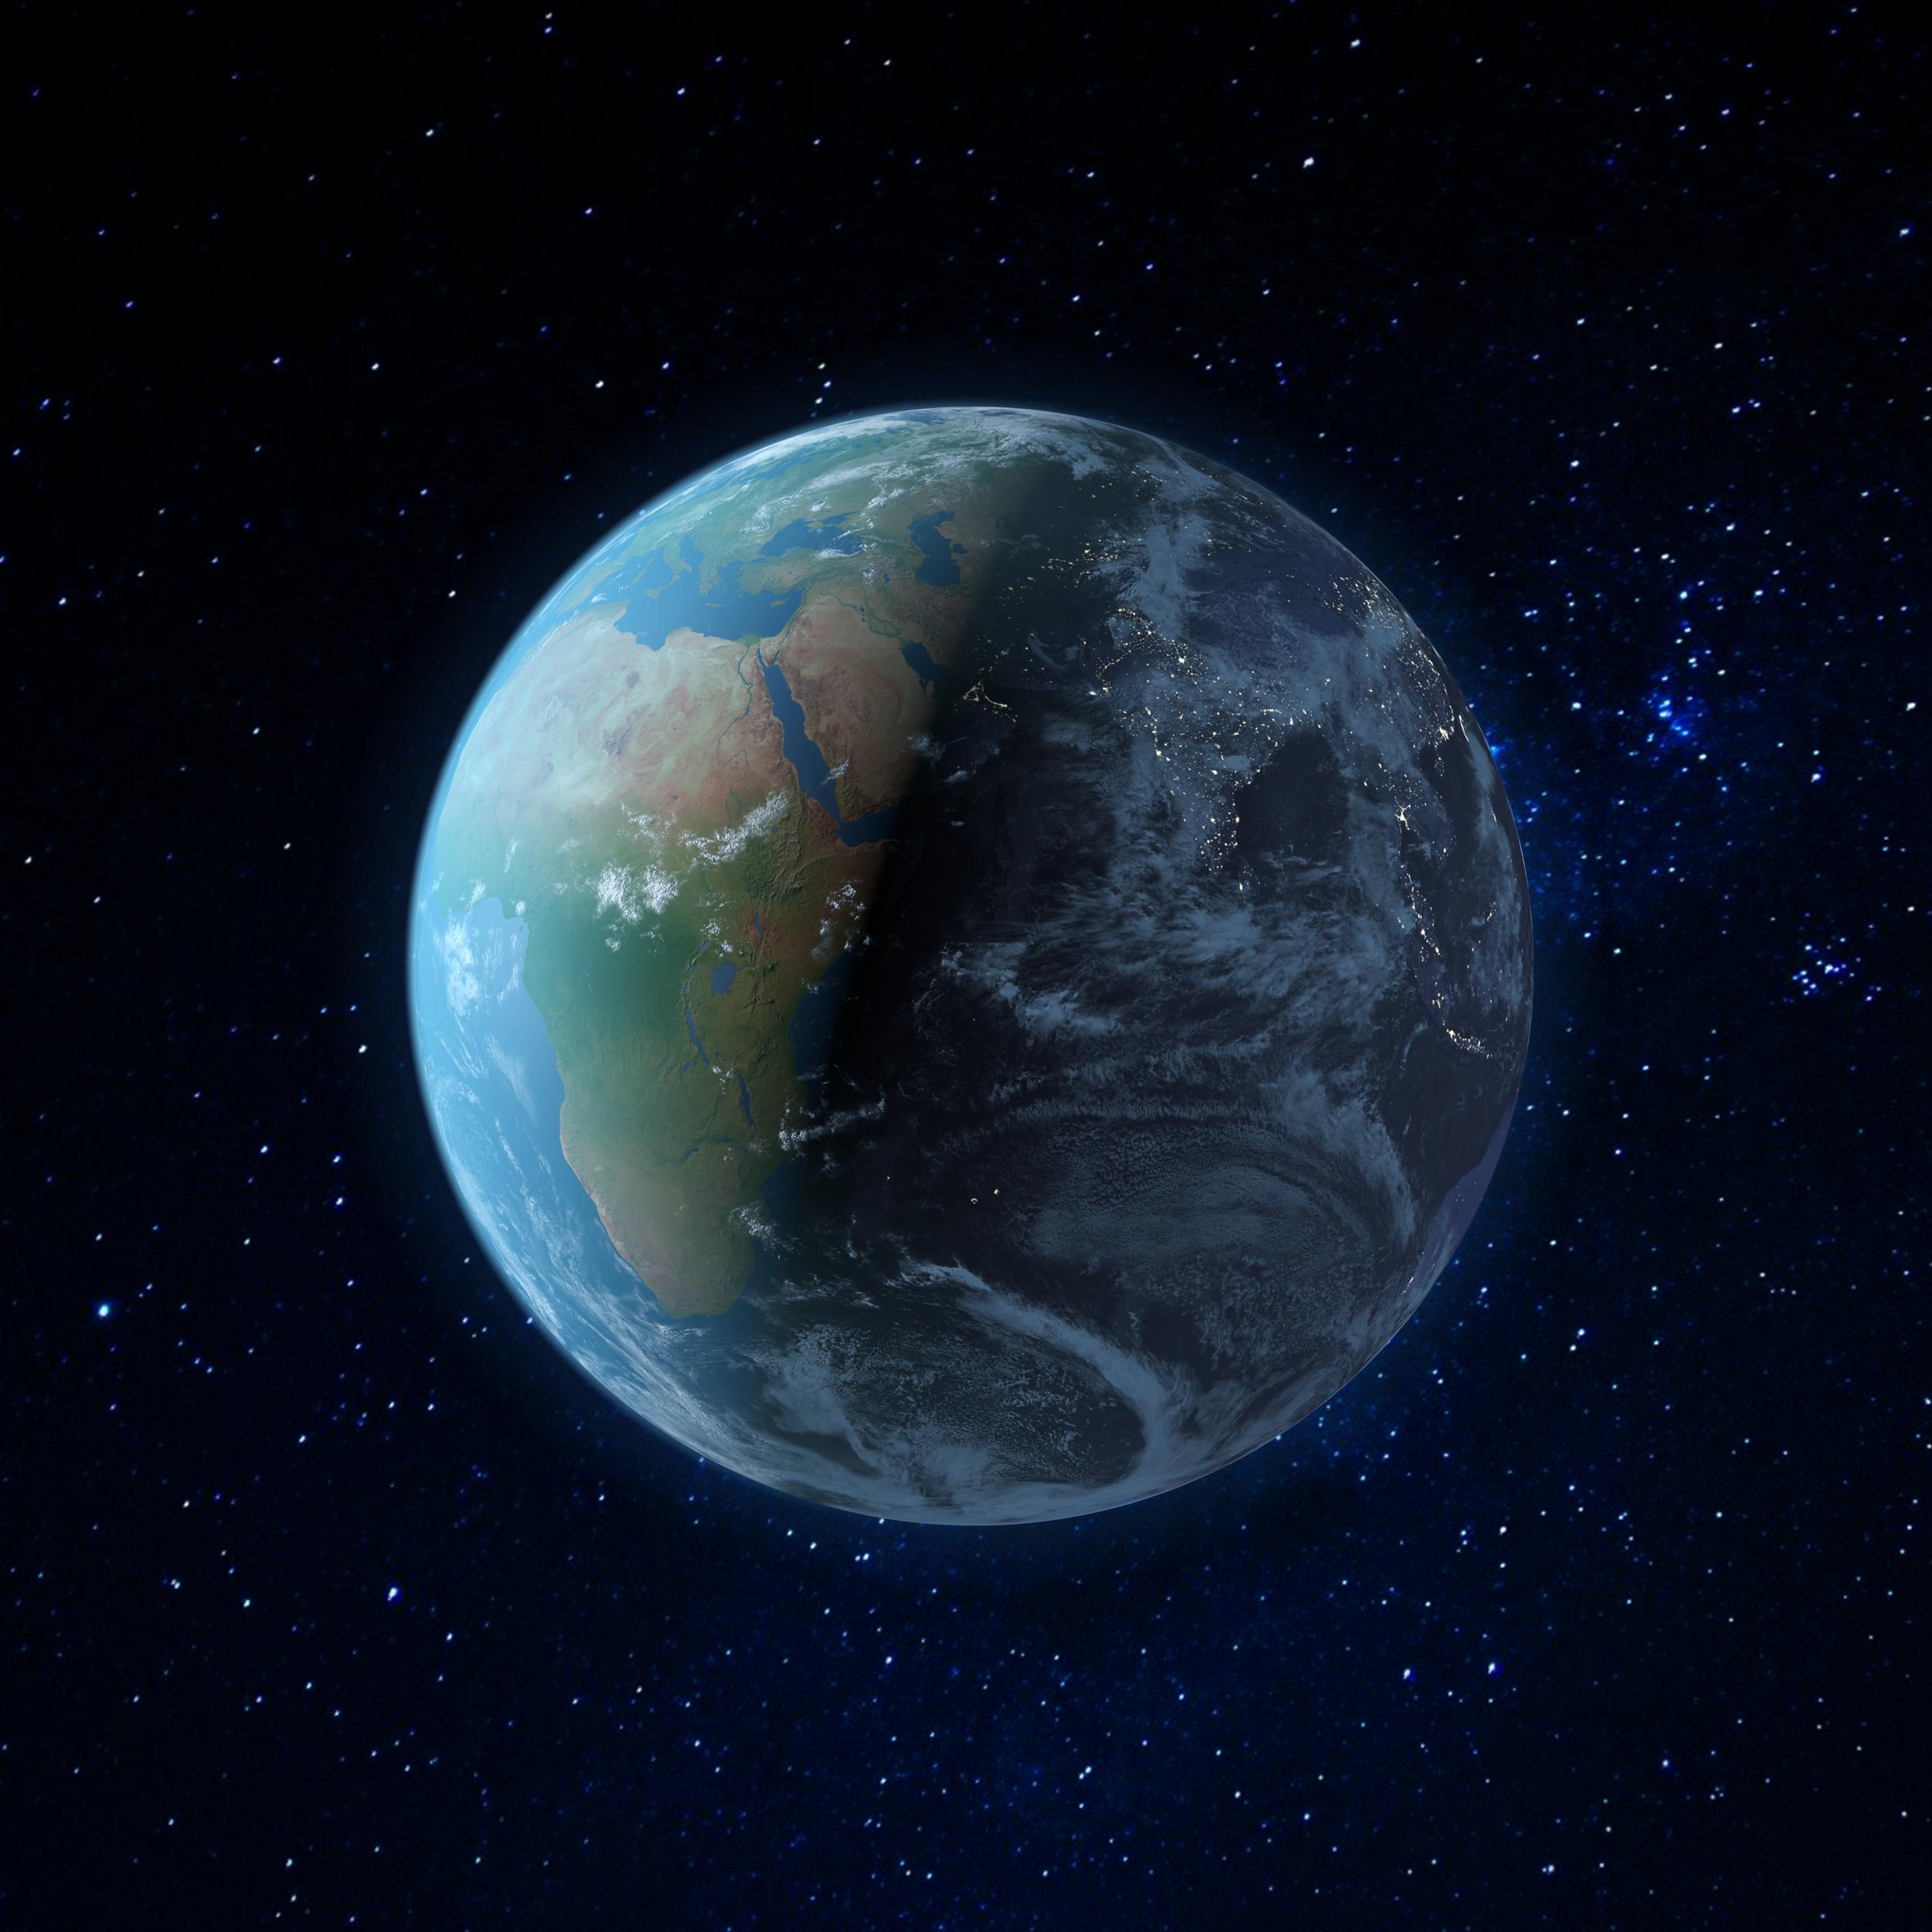 Earth_orbit_4000x4000_0180.png